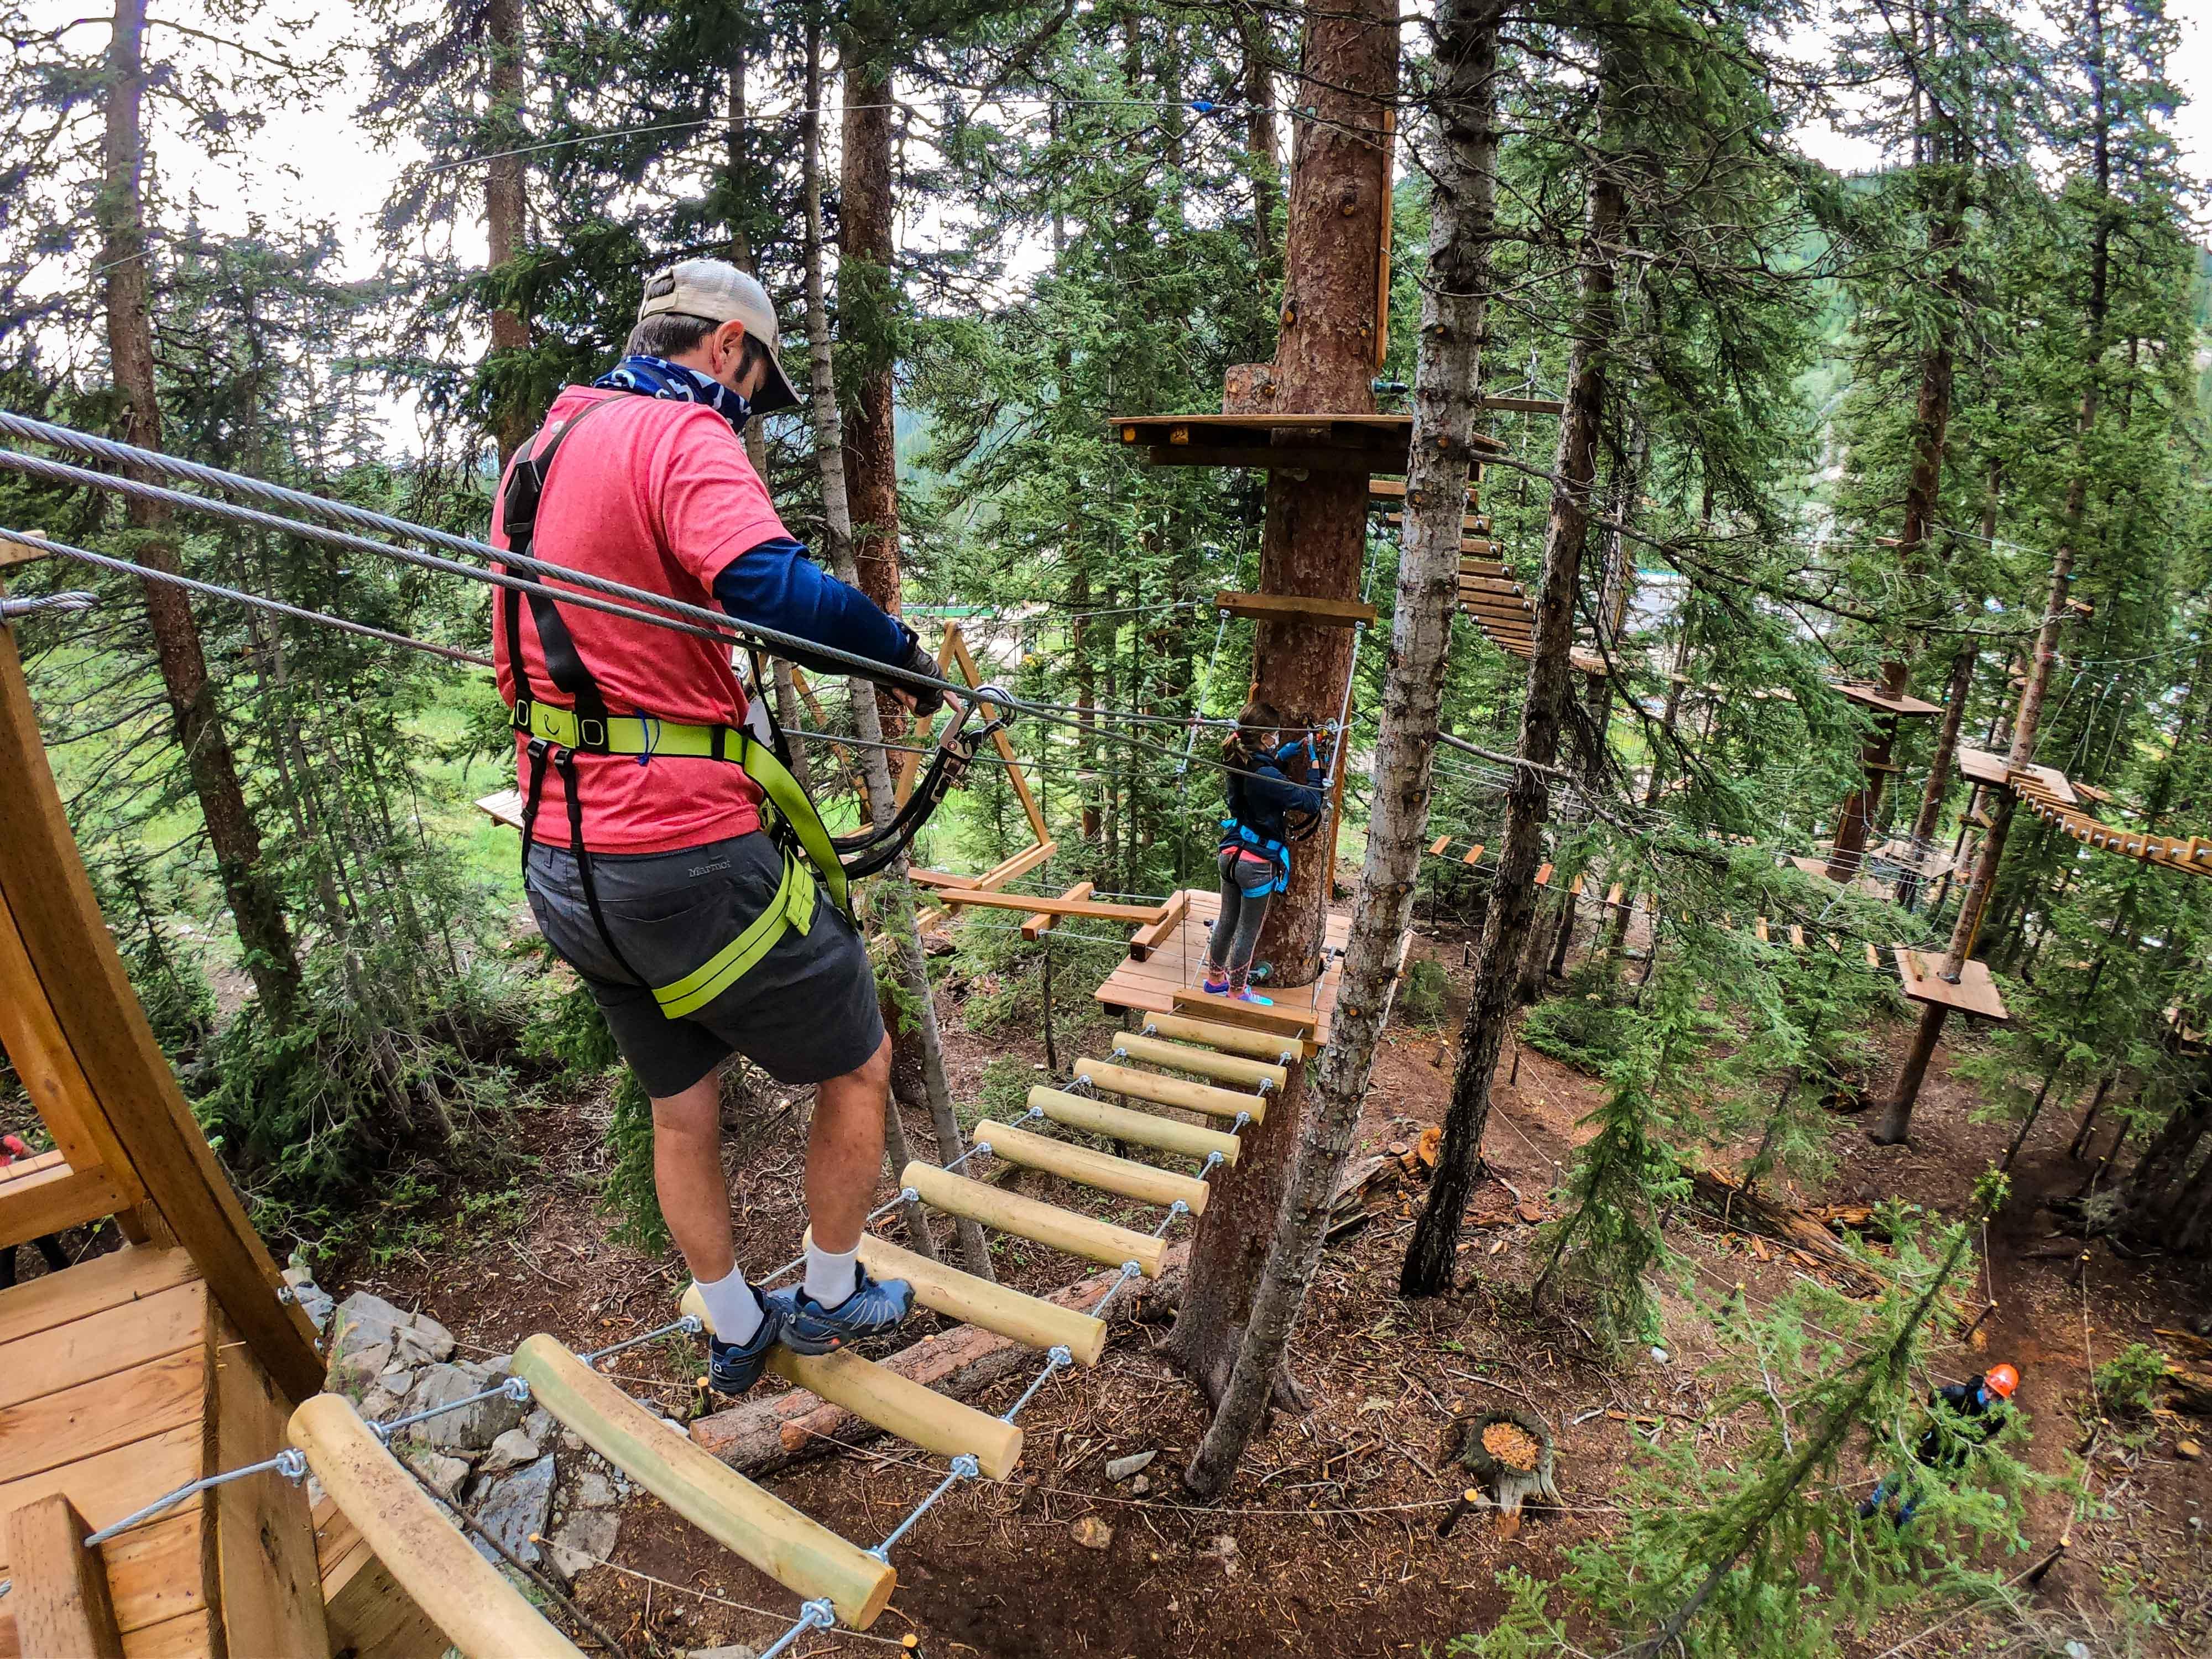 Summer Aerial Adventure Park Arapahoe Basin Ski Snowboard Area